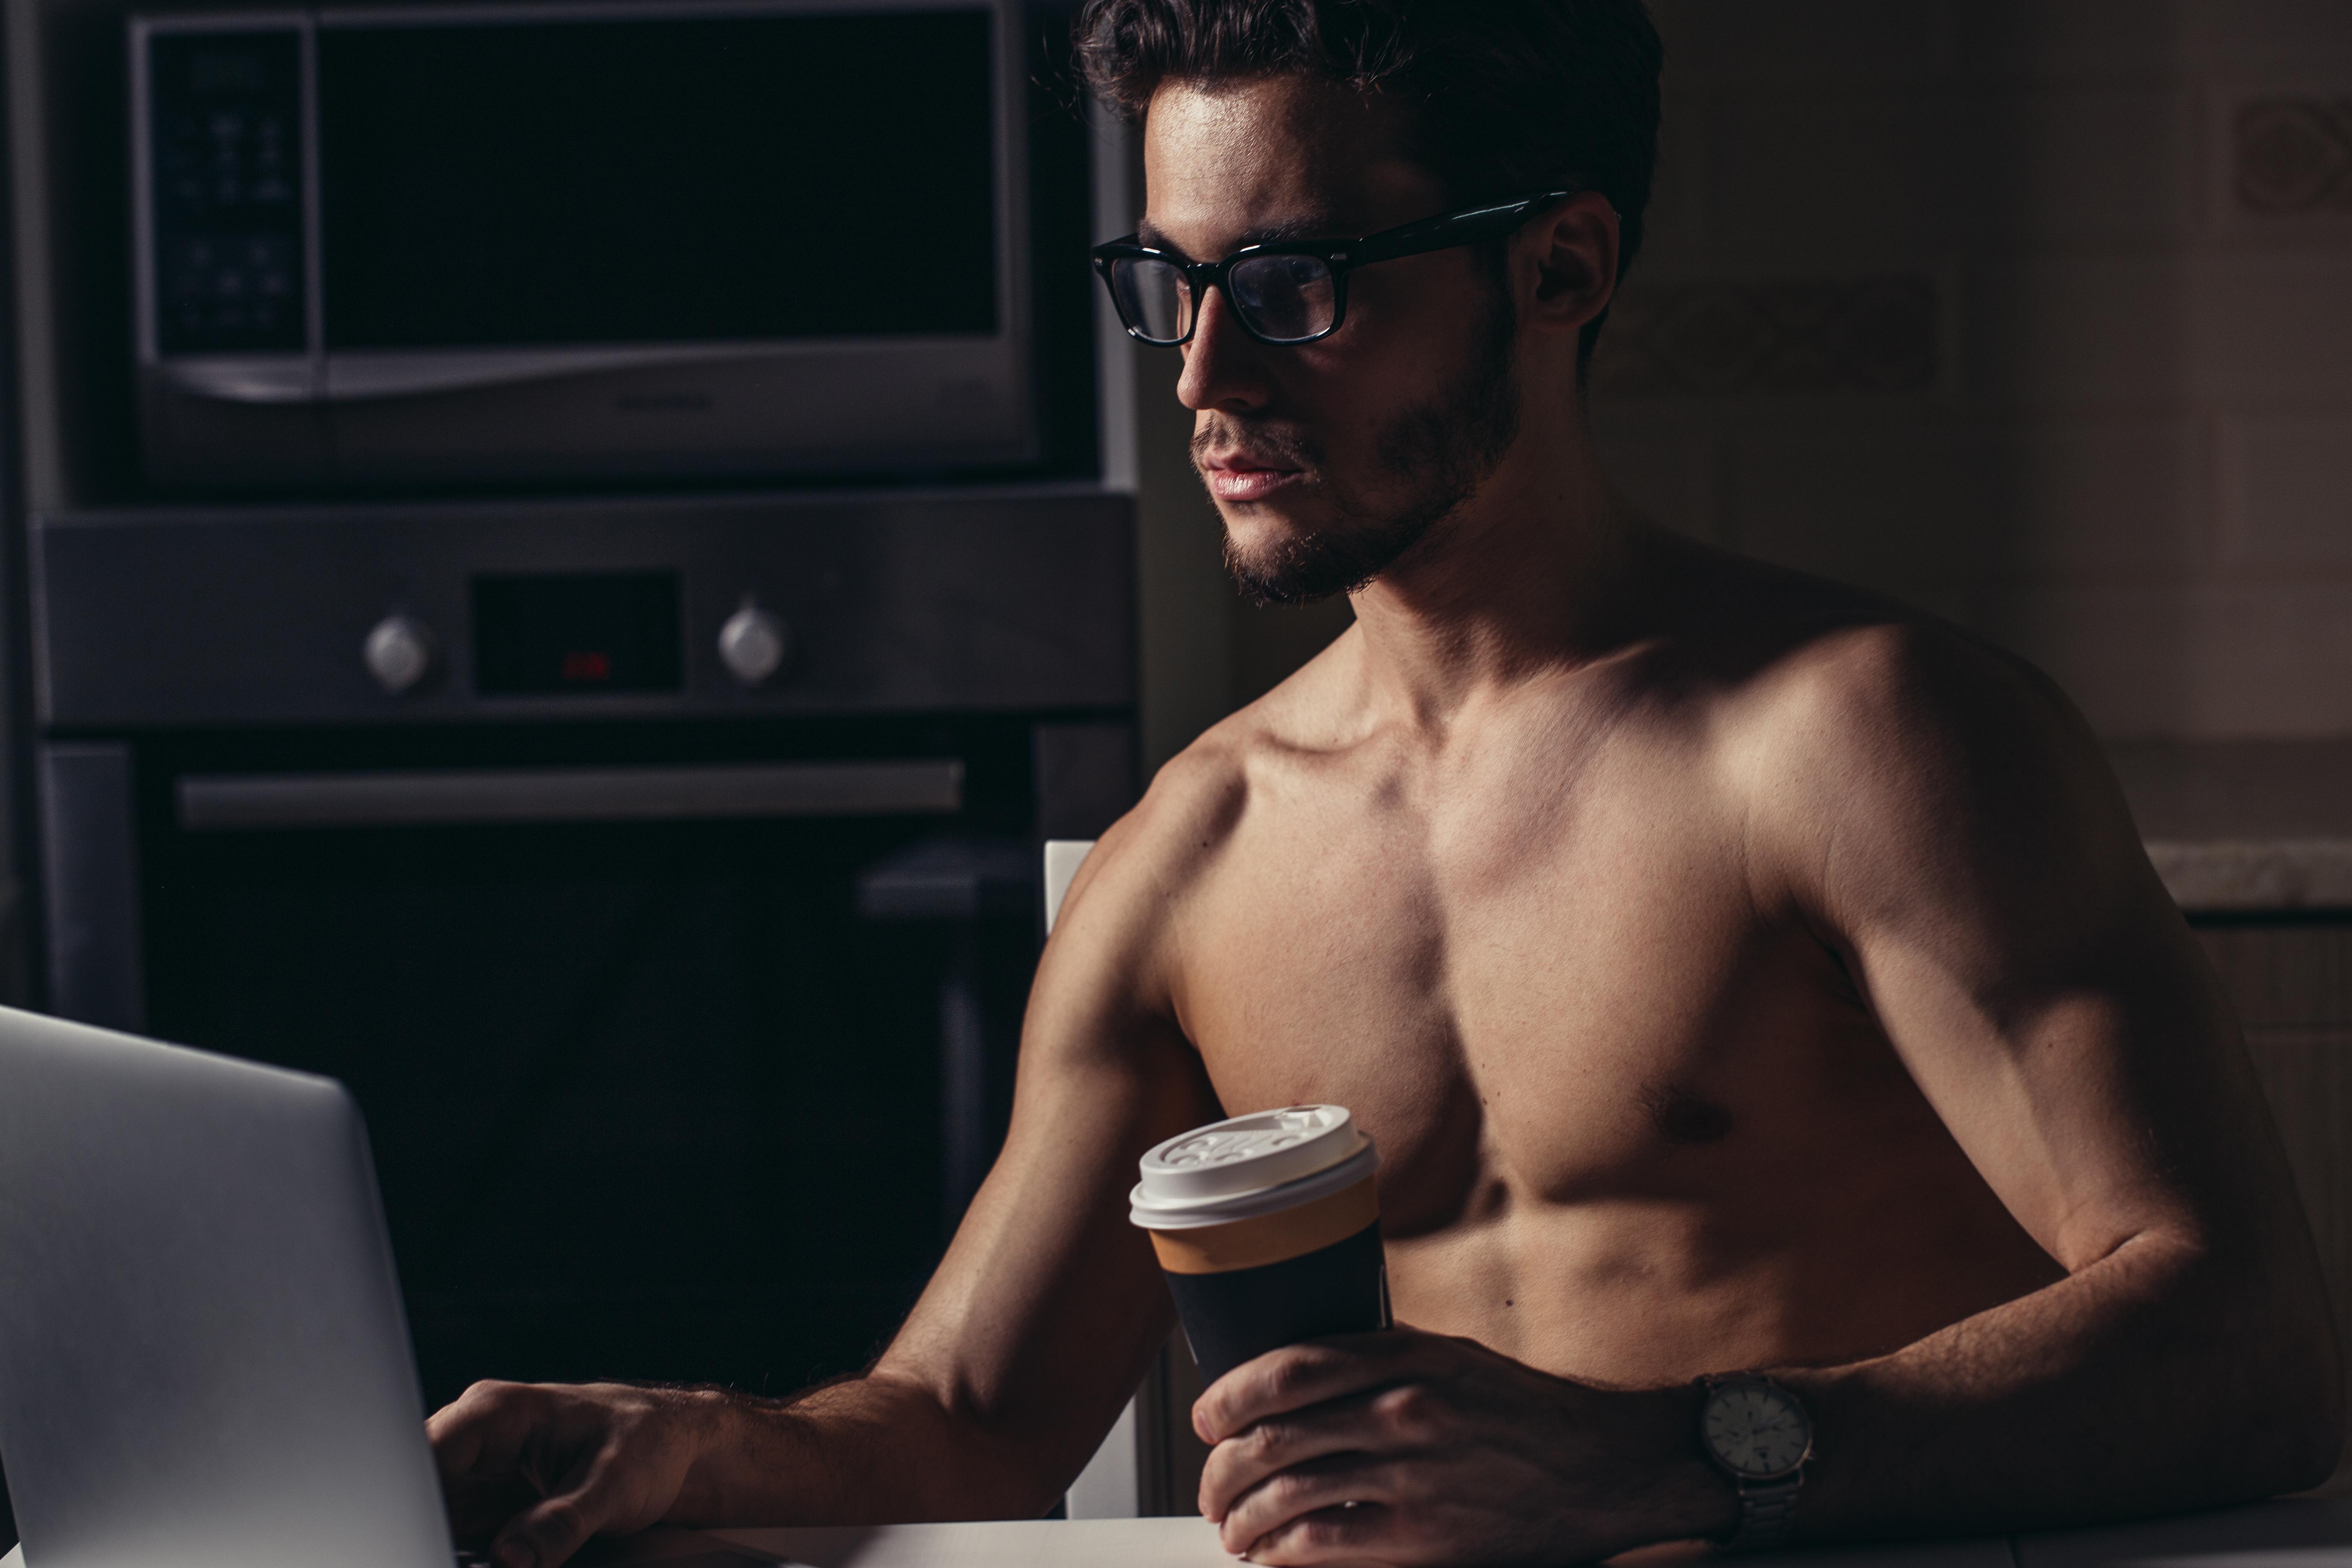 gay dating site Gaydar Dating advertenties op Pandora